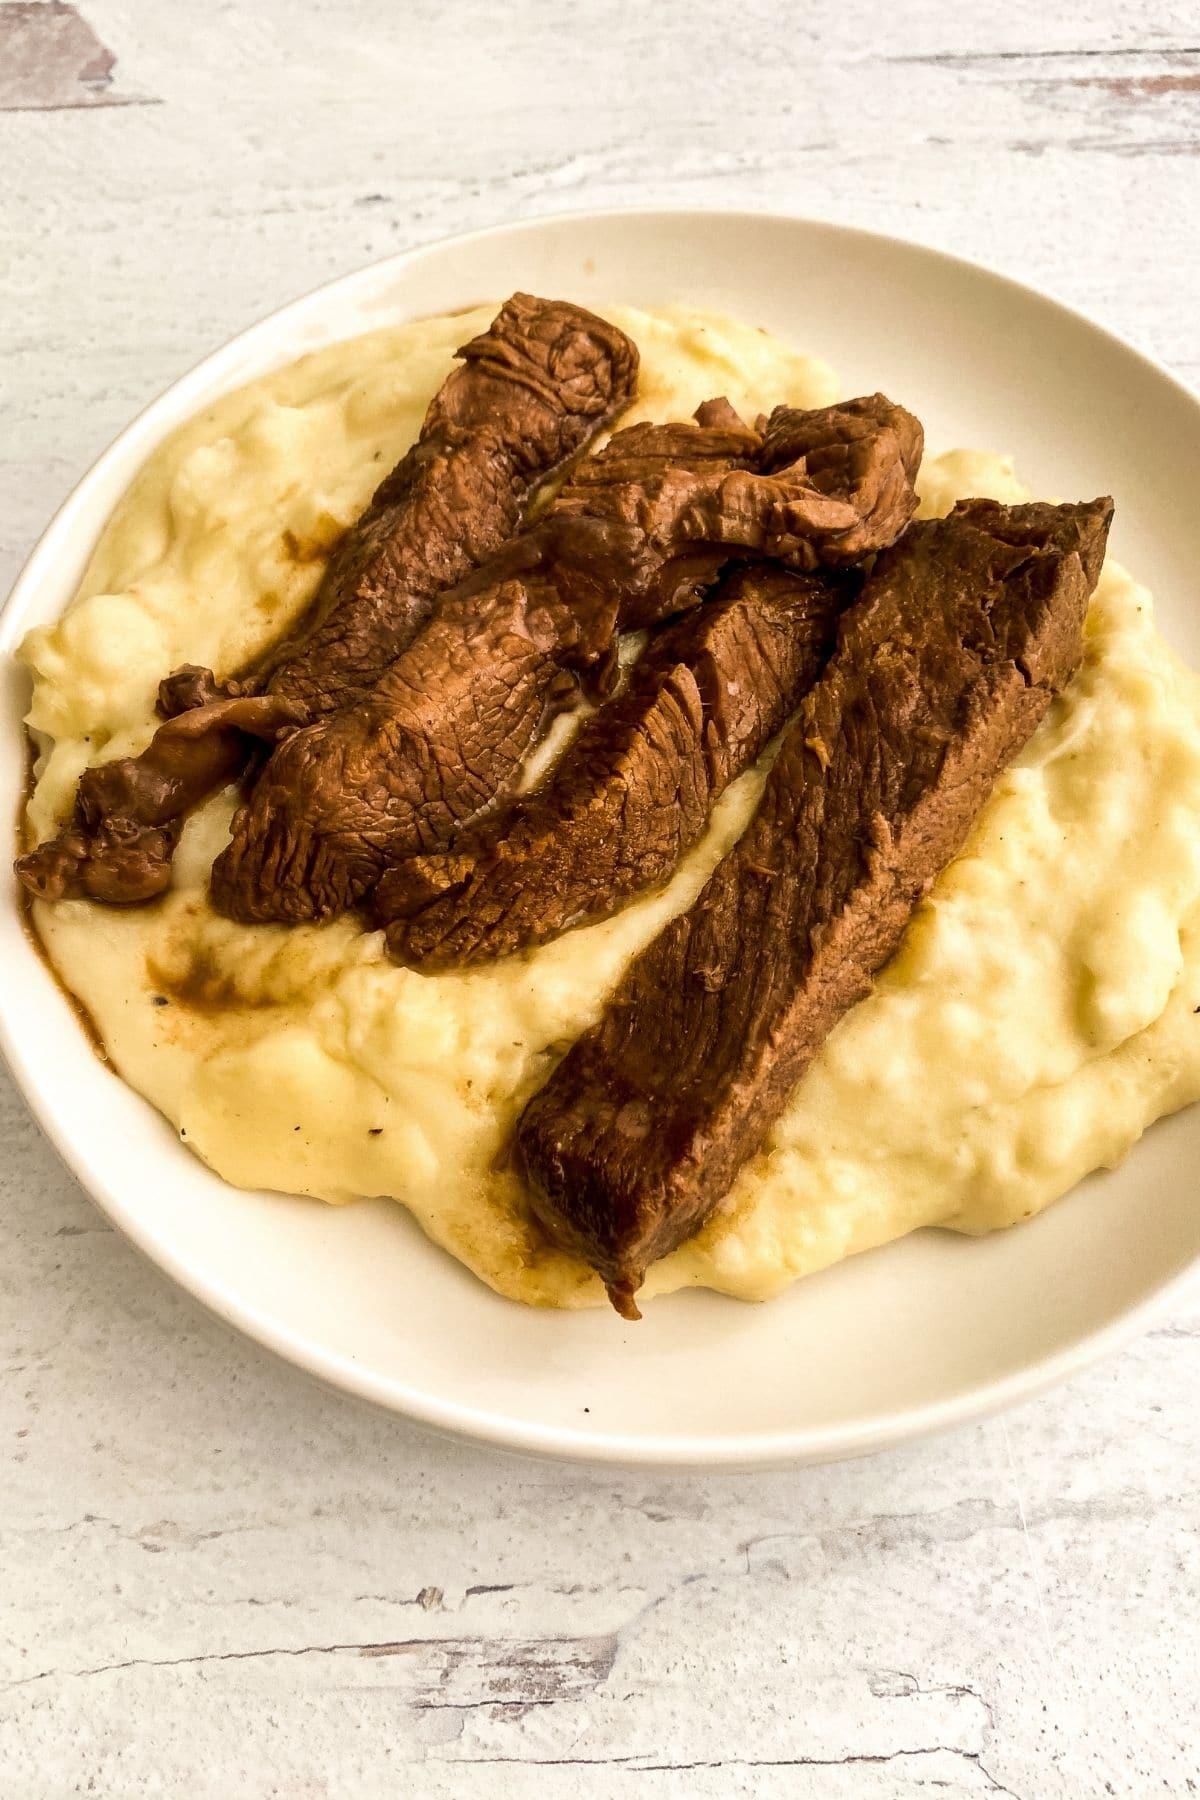 Large white bowl of mashed potatoes and steak